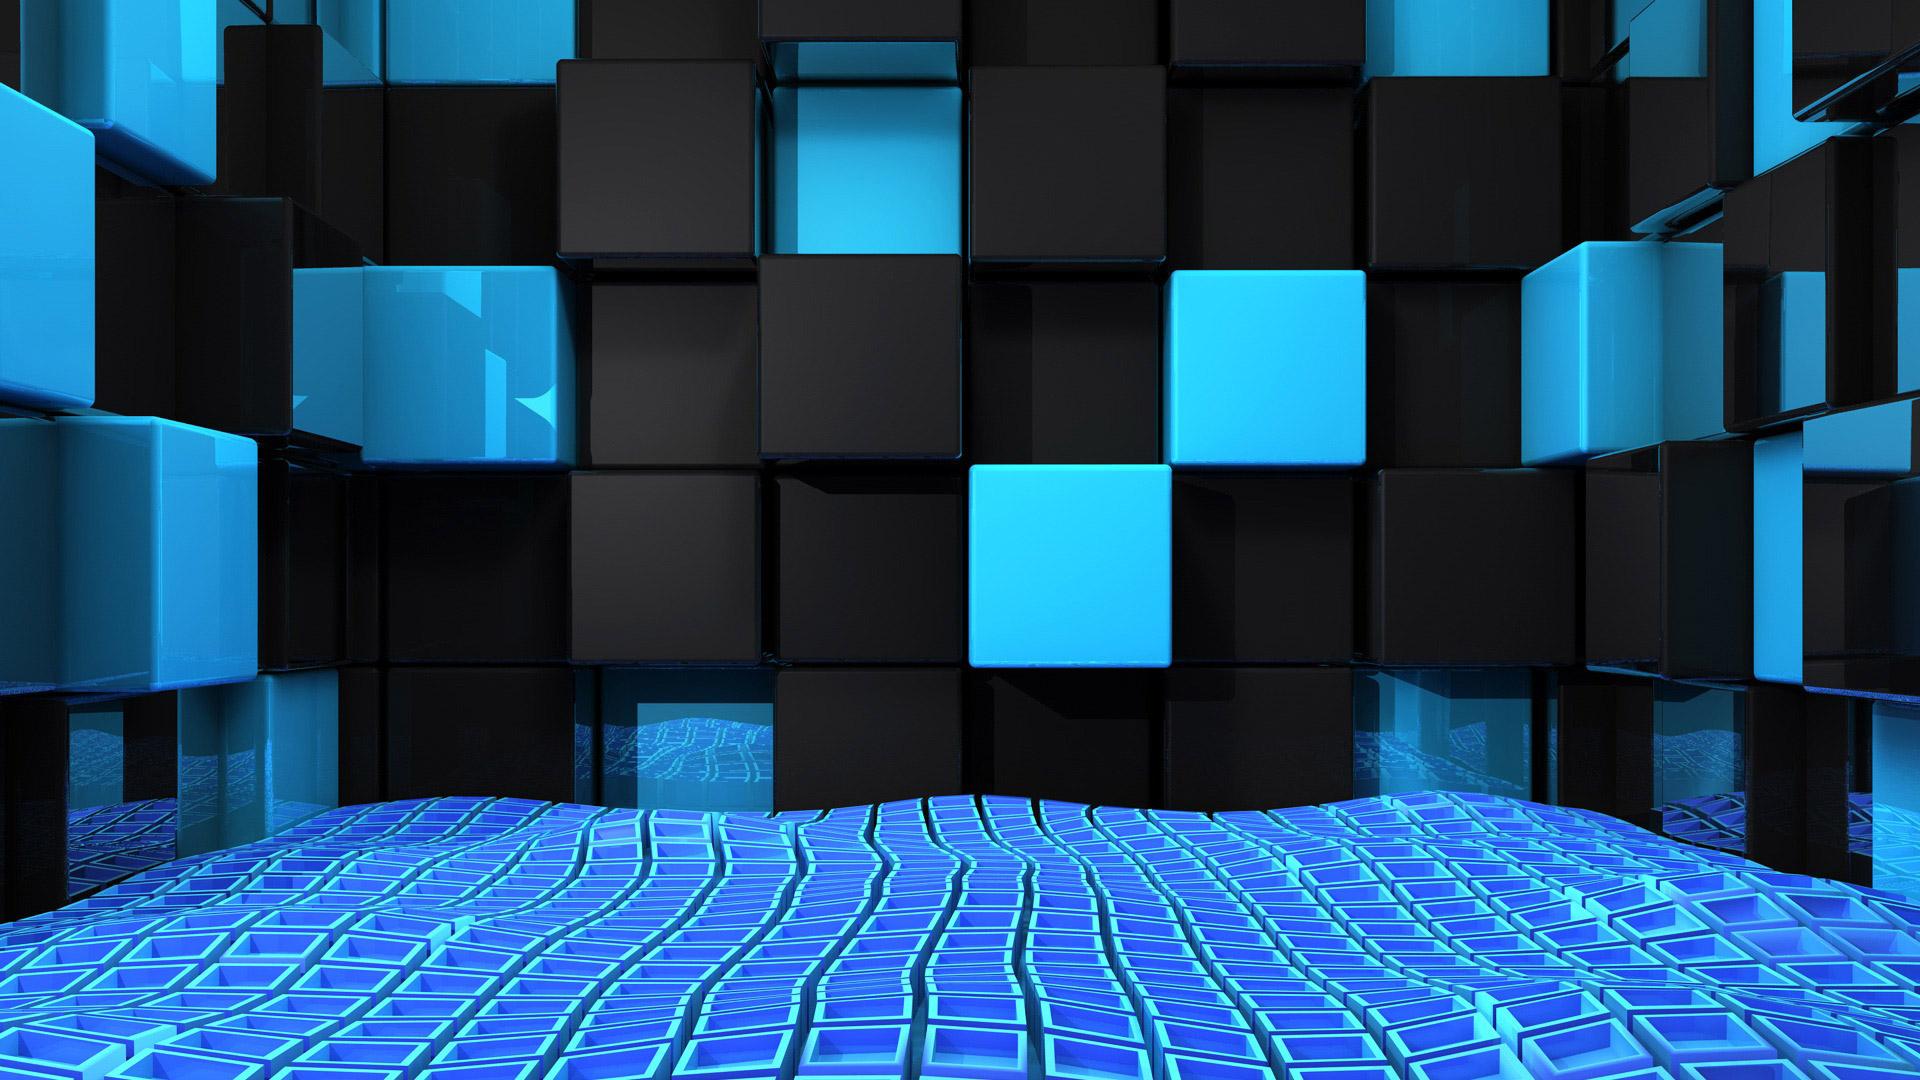 hd wallpaper 3d cubes abstract backgrounds wallpapers55com   Best 1920x1080